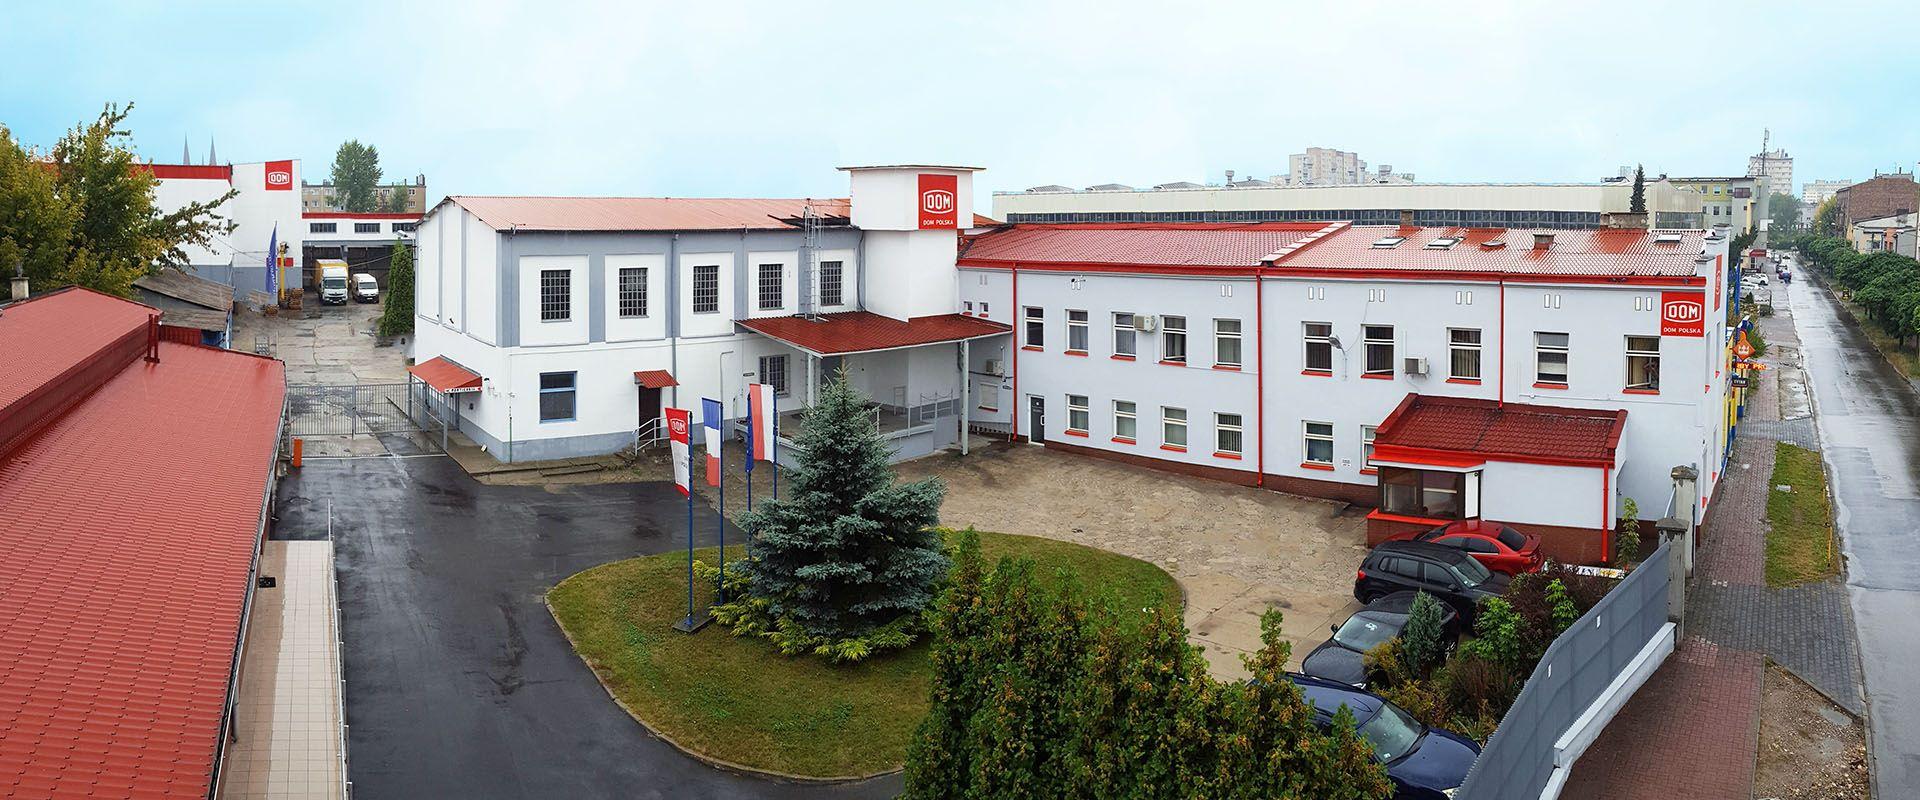 Dom Polska office